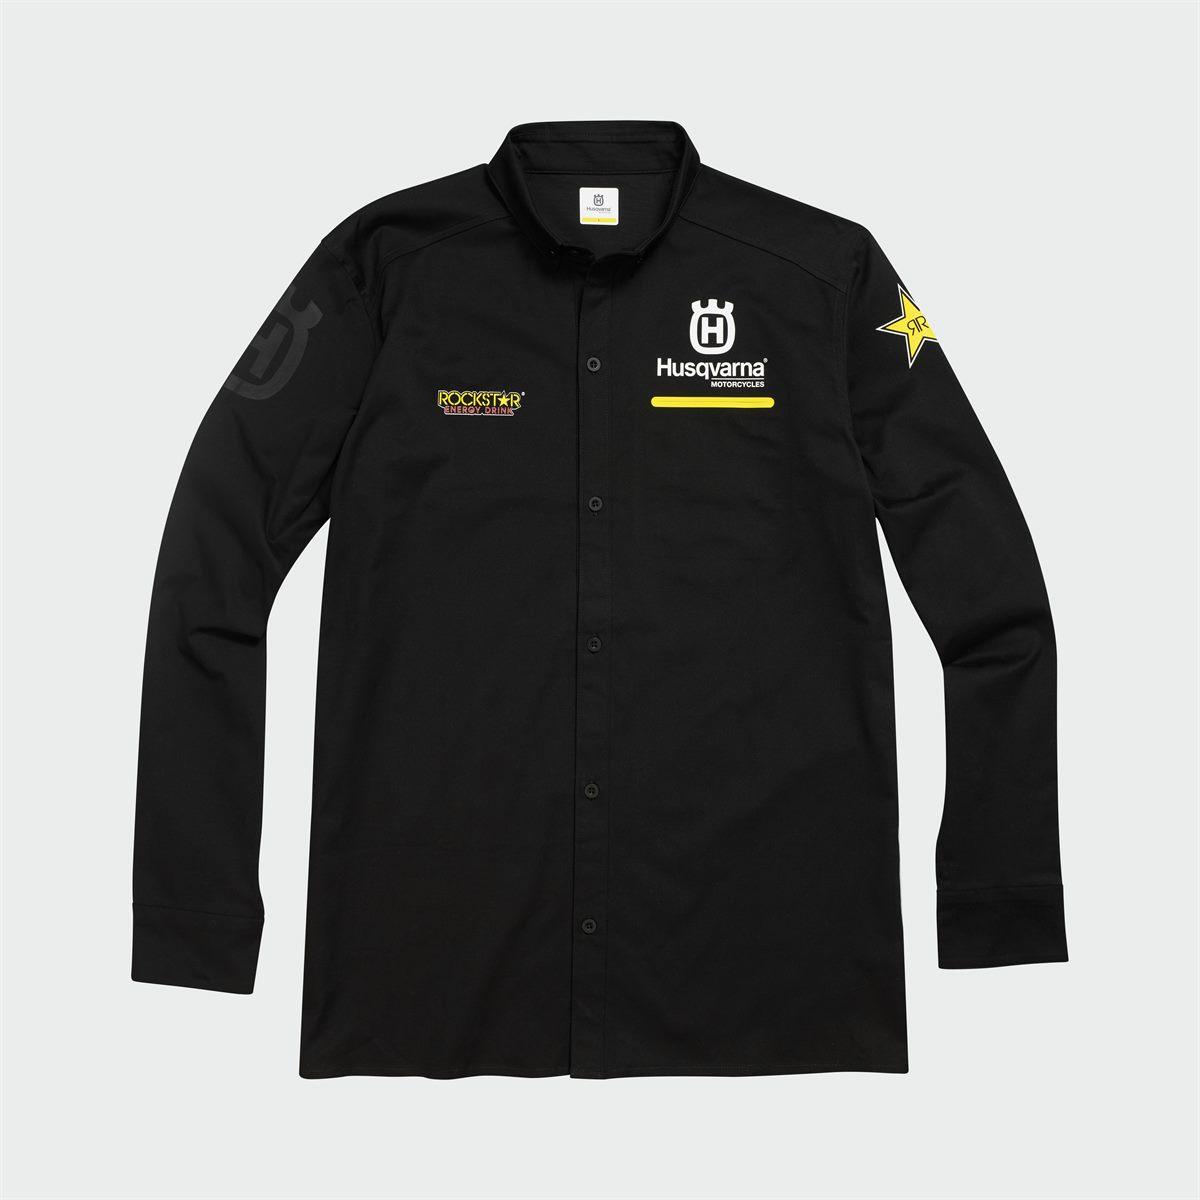 NEW Husqvarna Replica Team Shirt All Sizes Rockstar Edition